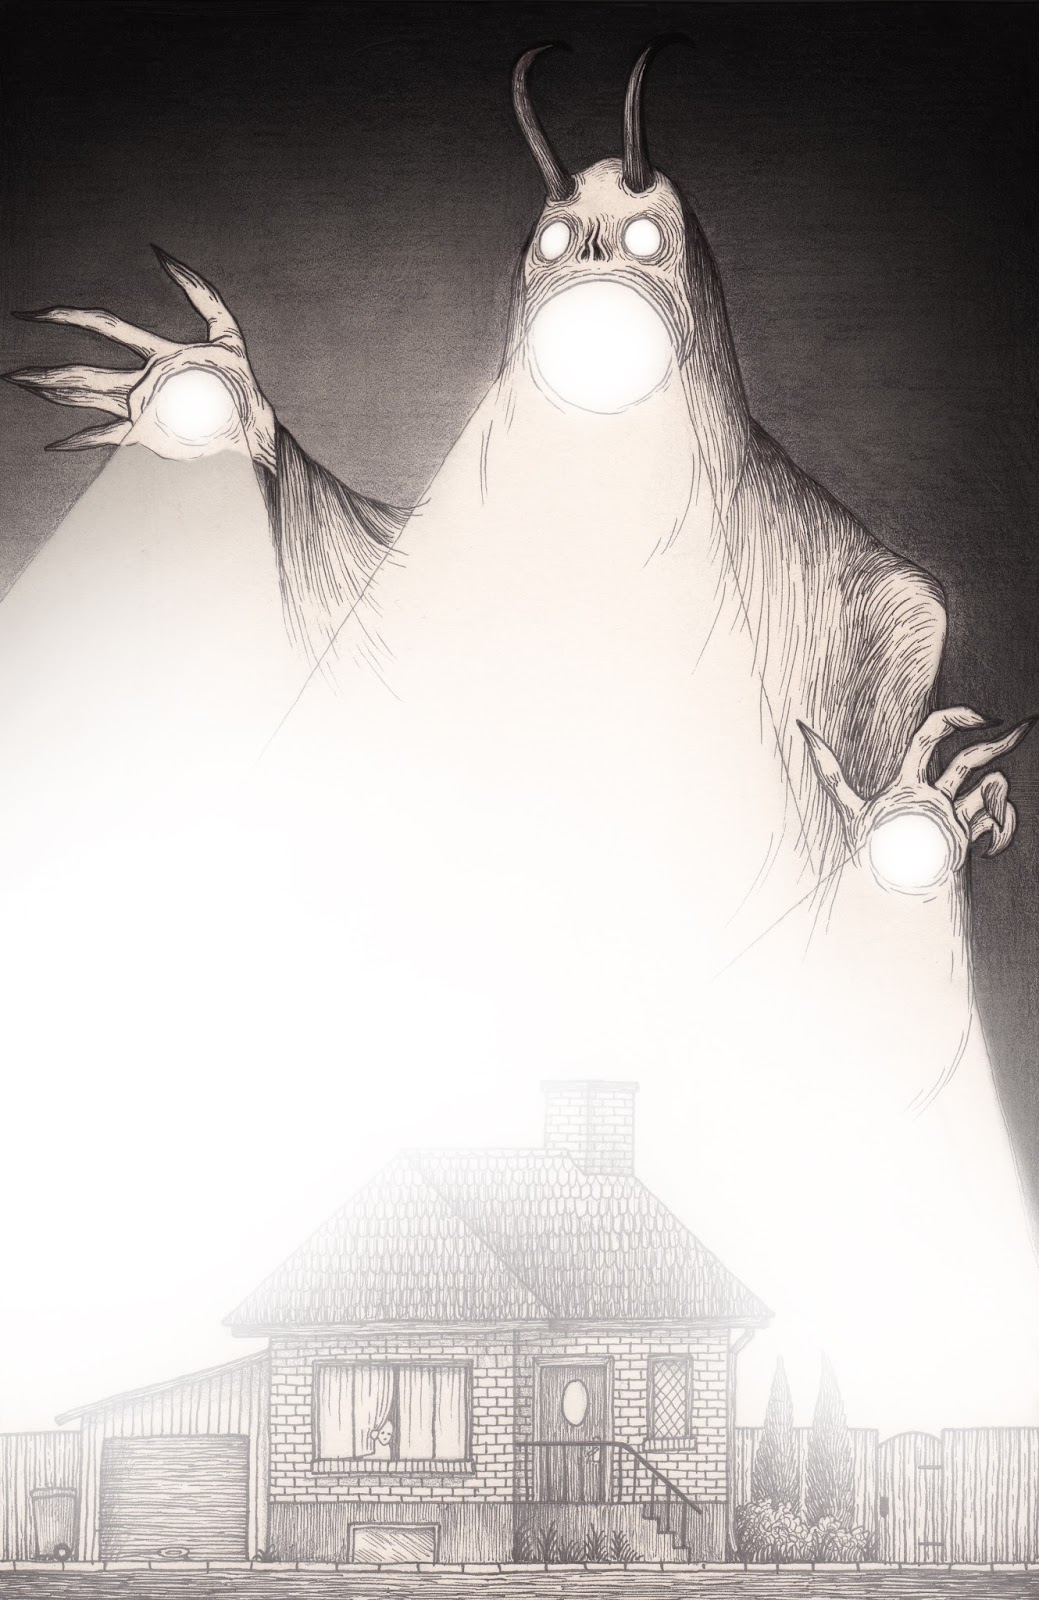 Stress Monster Drawings by Don Kenn - Art People Gallery